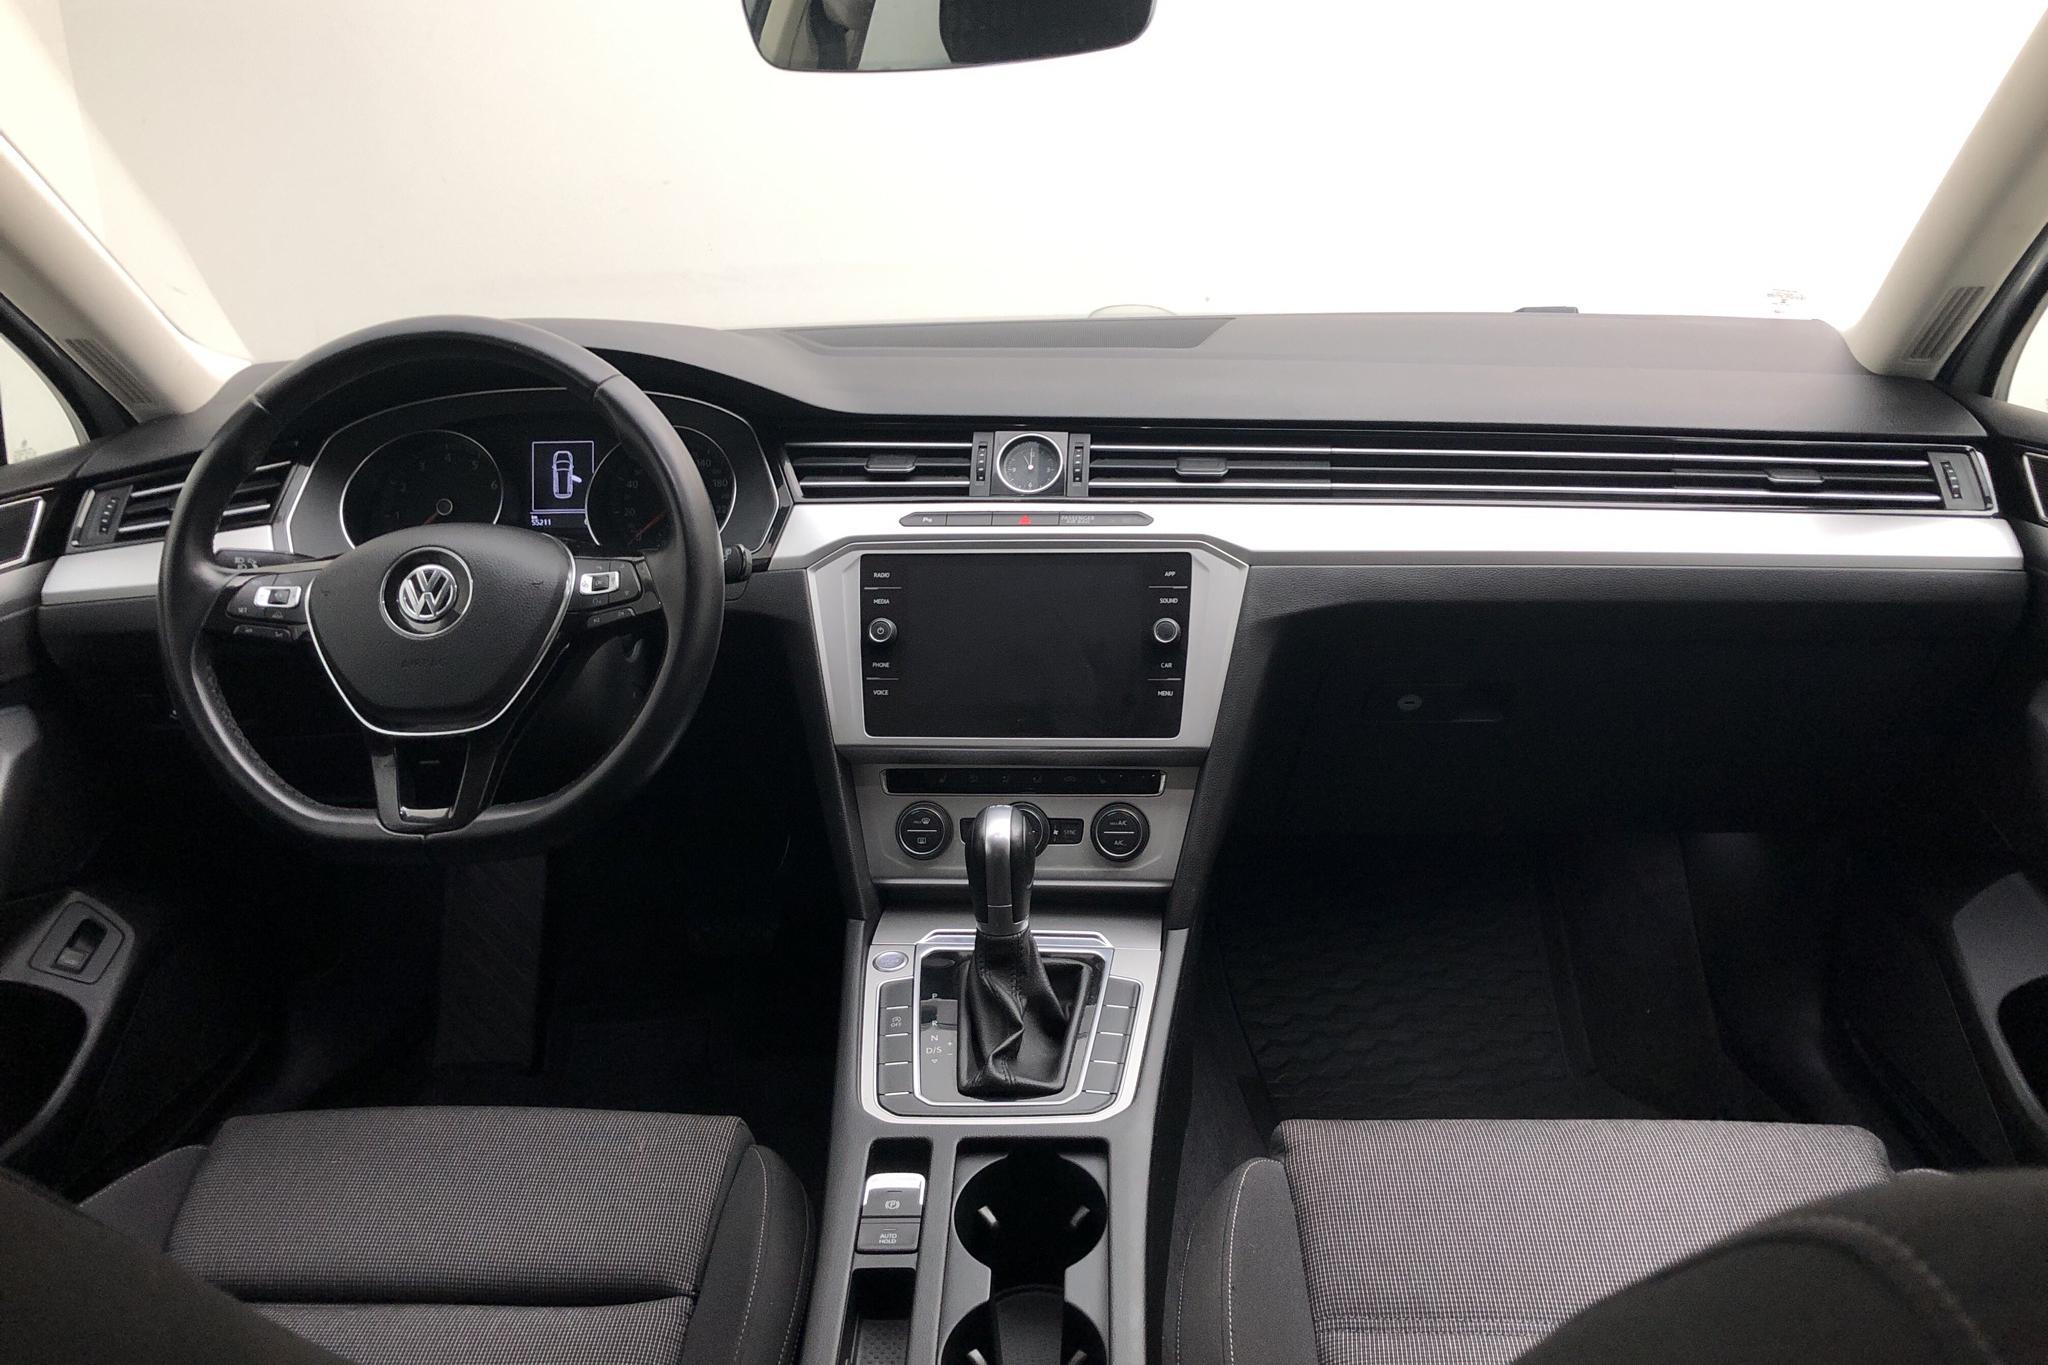 VW Passat 1.4 TSI Sportscombi (150hk) - 55 220 km - Automatic - white - 2018